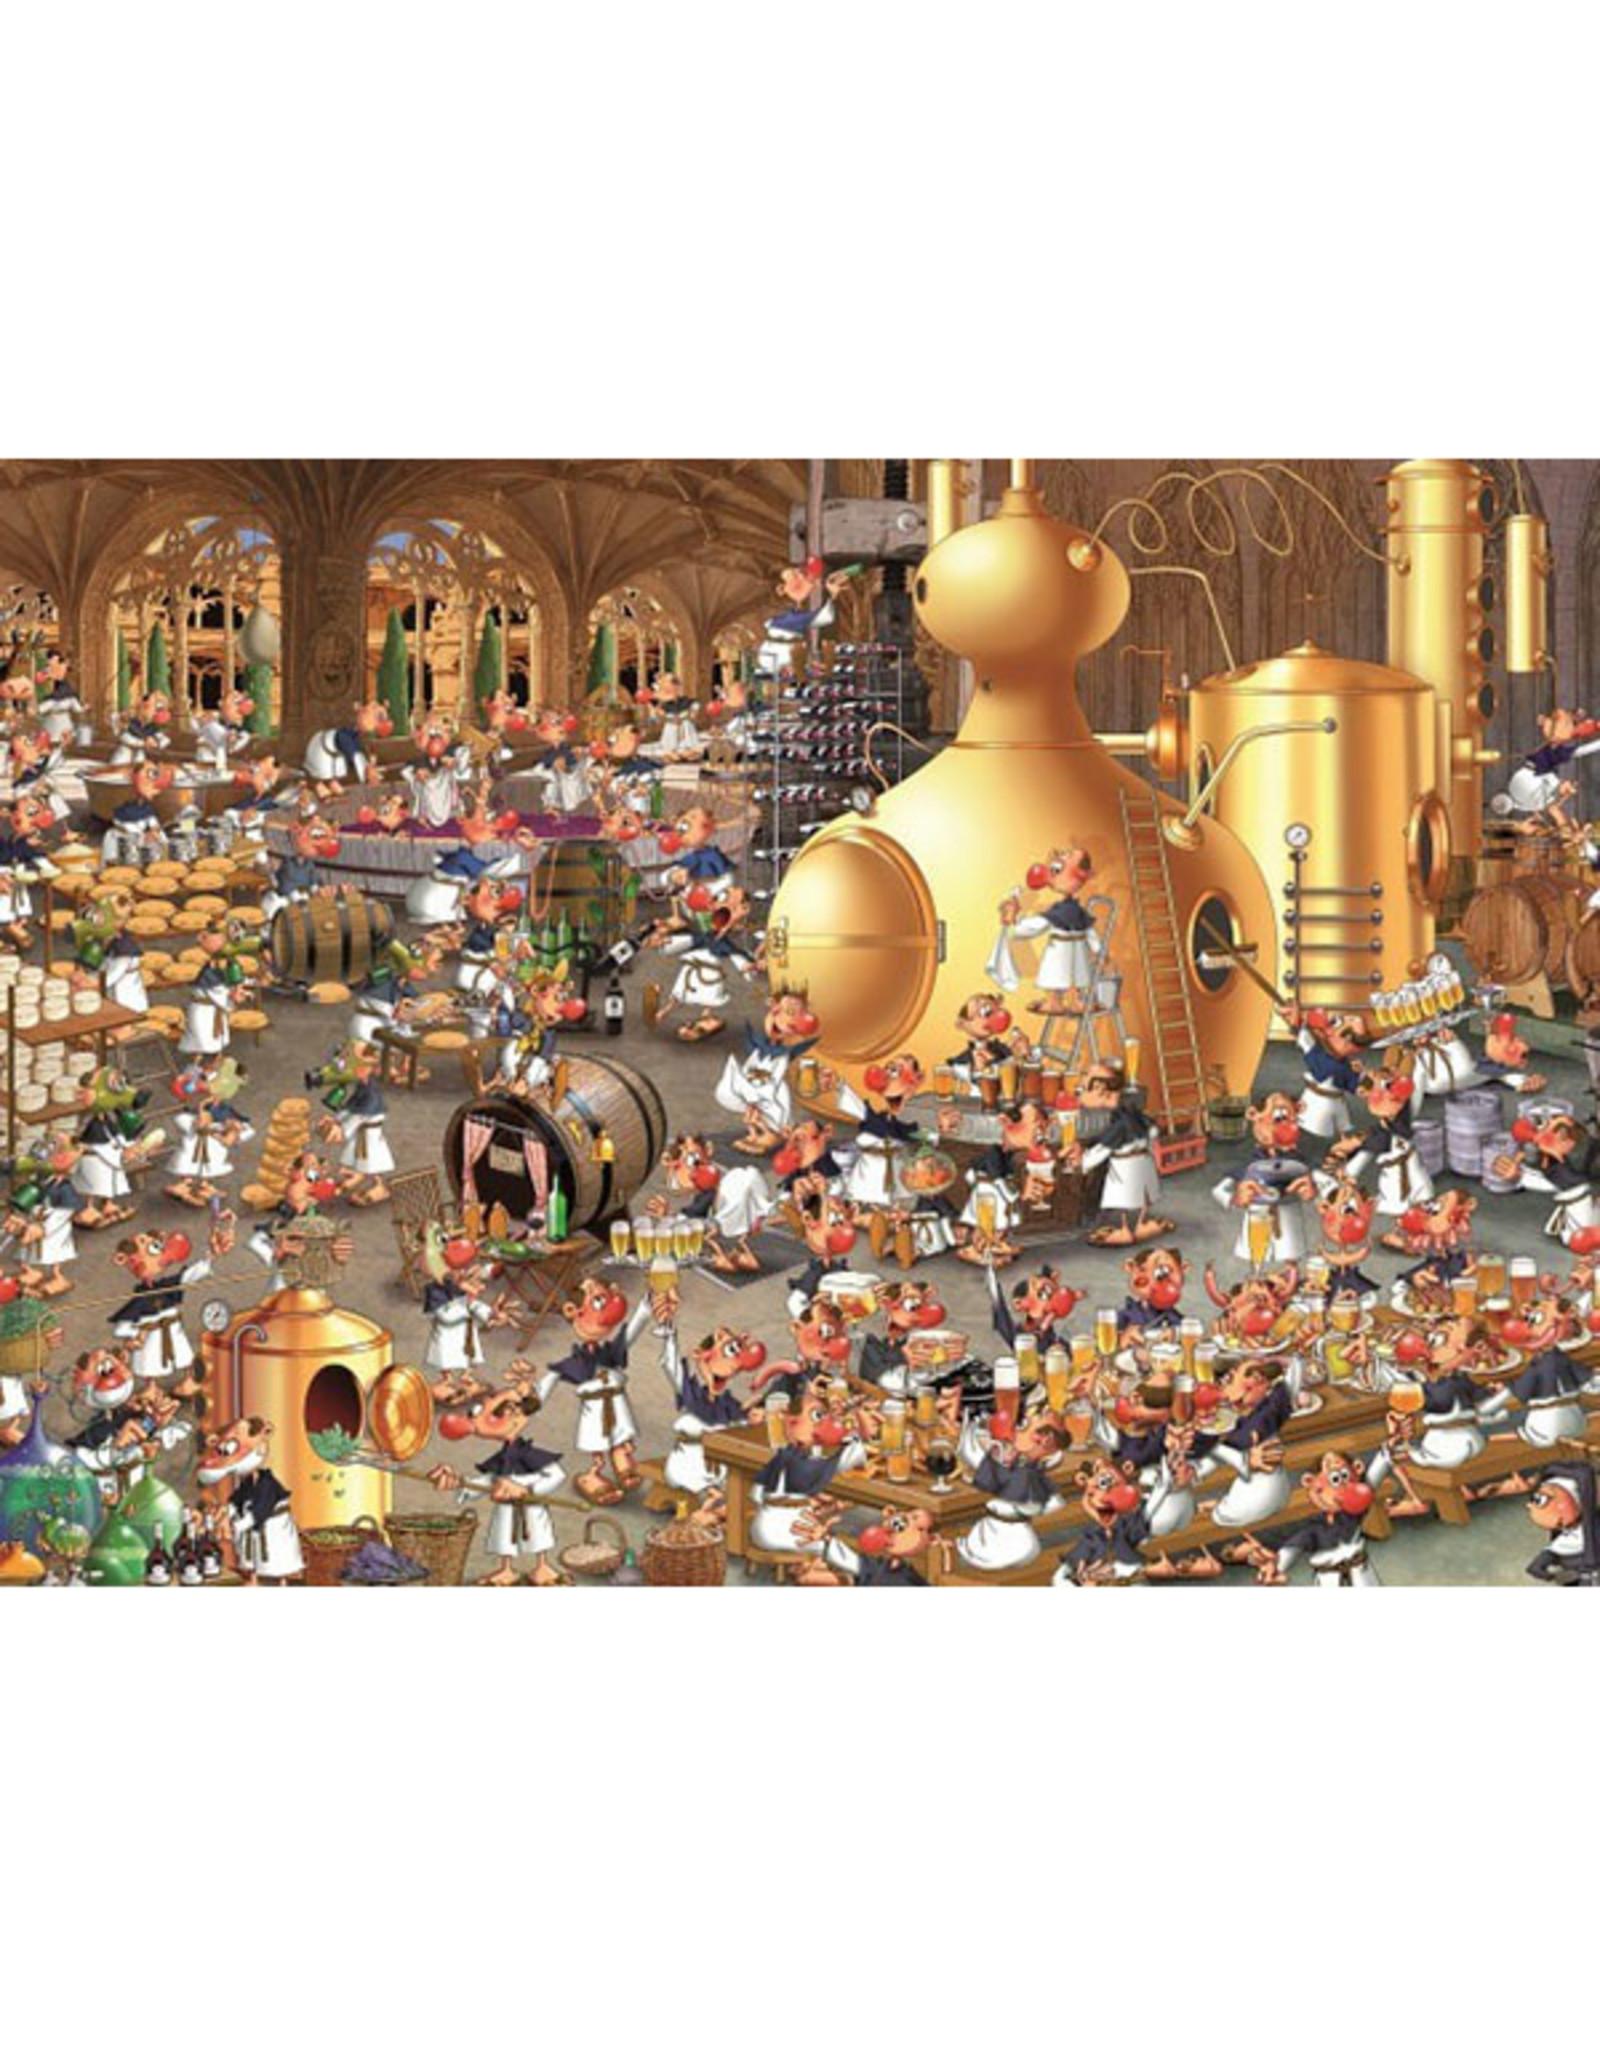 Piatnik Brewery 1000pc Puzzle